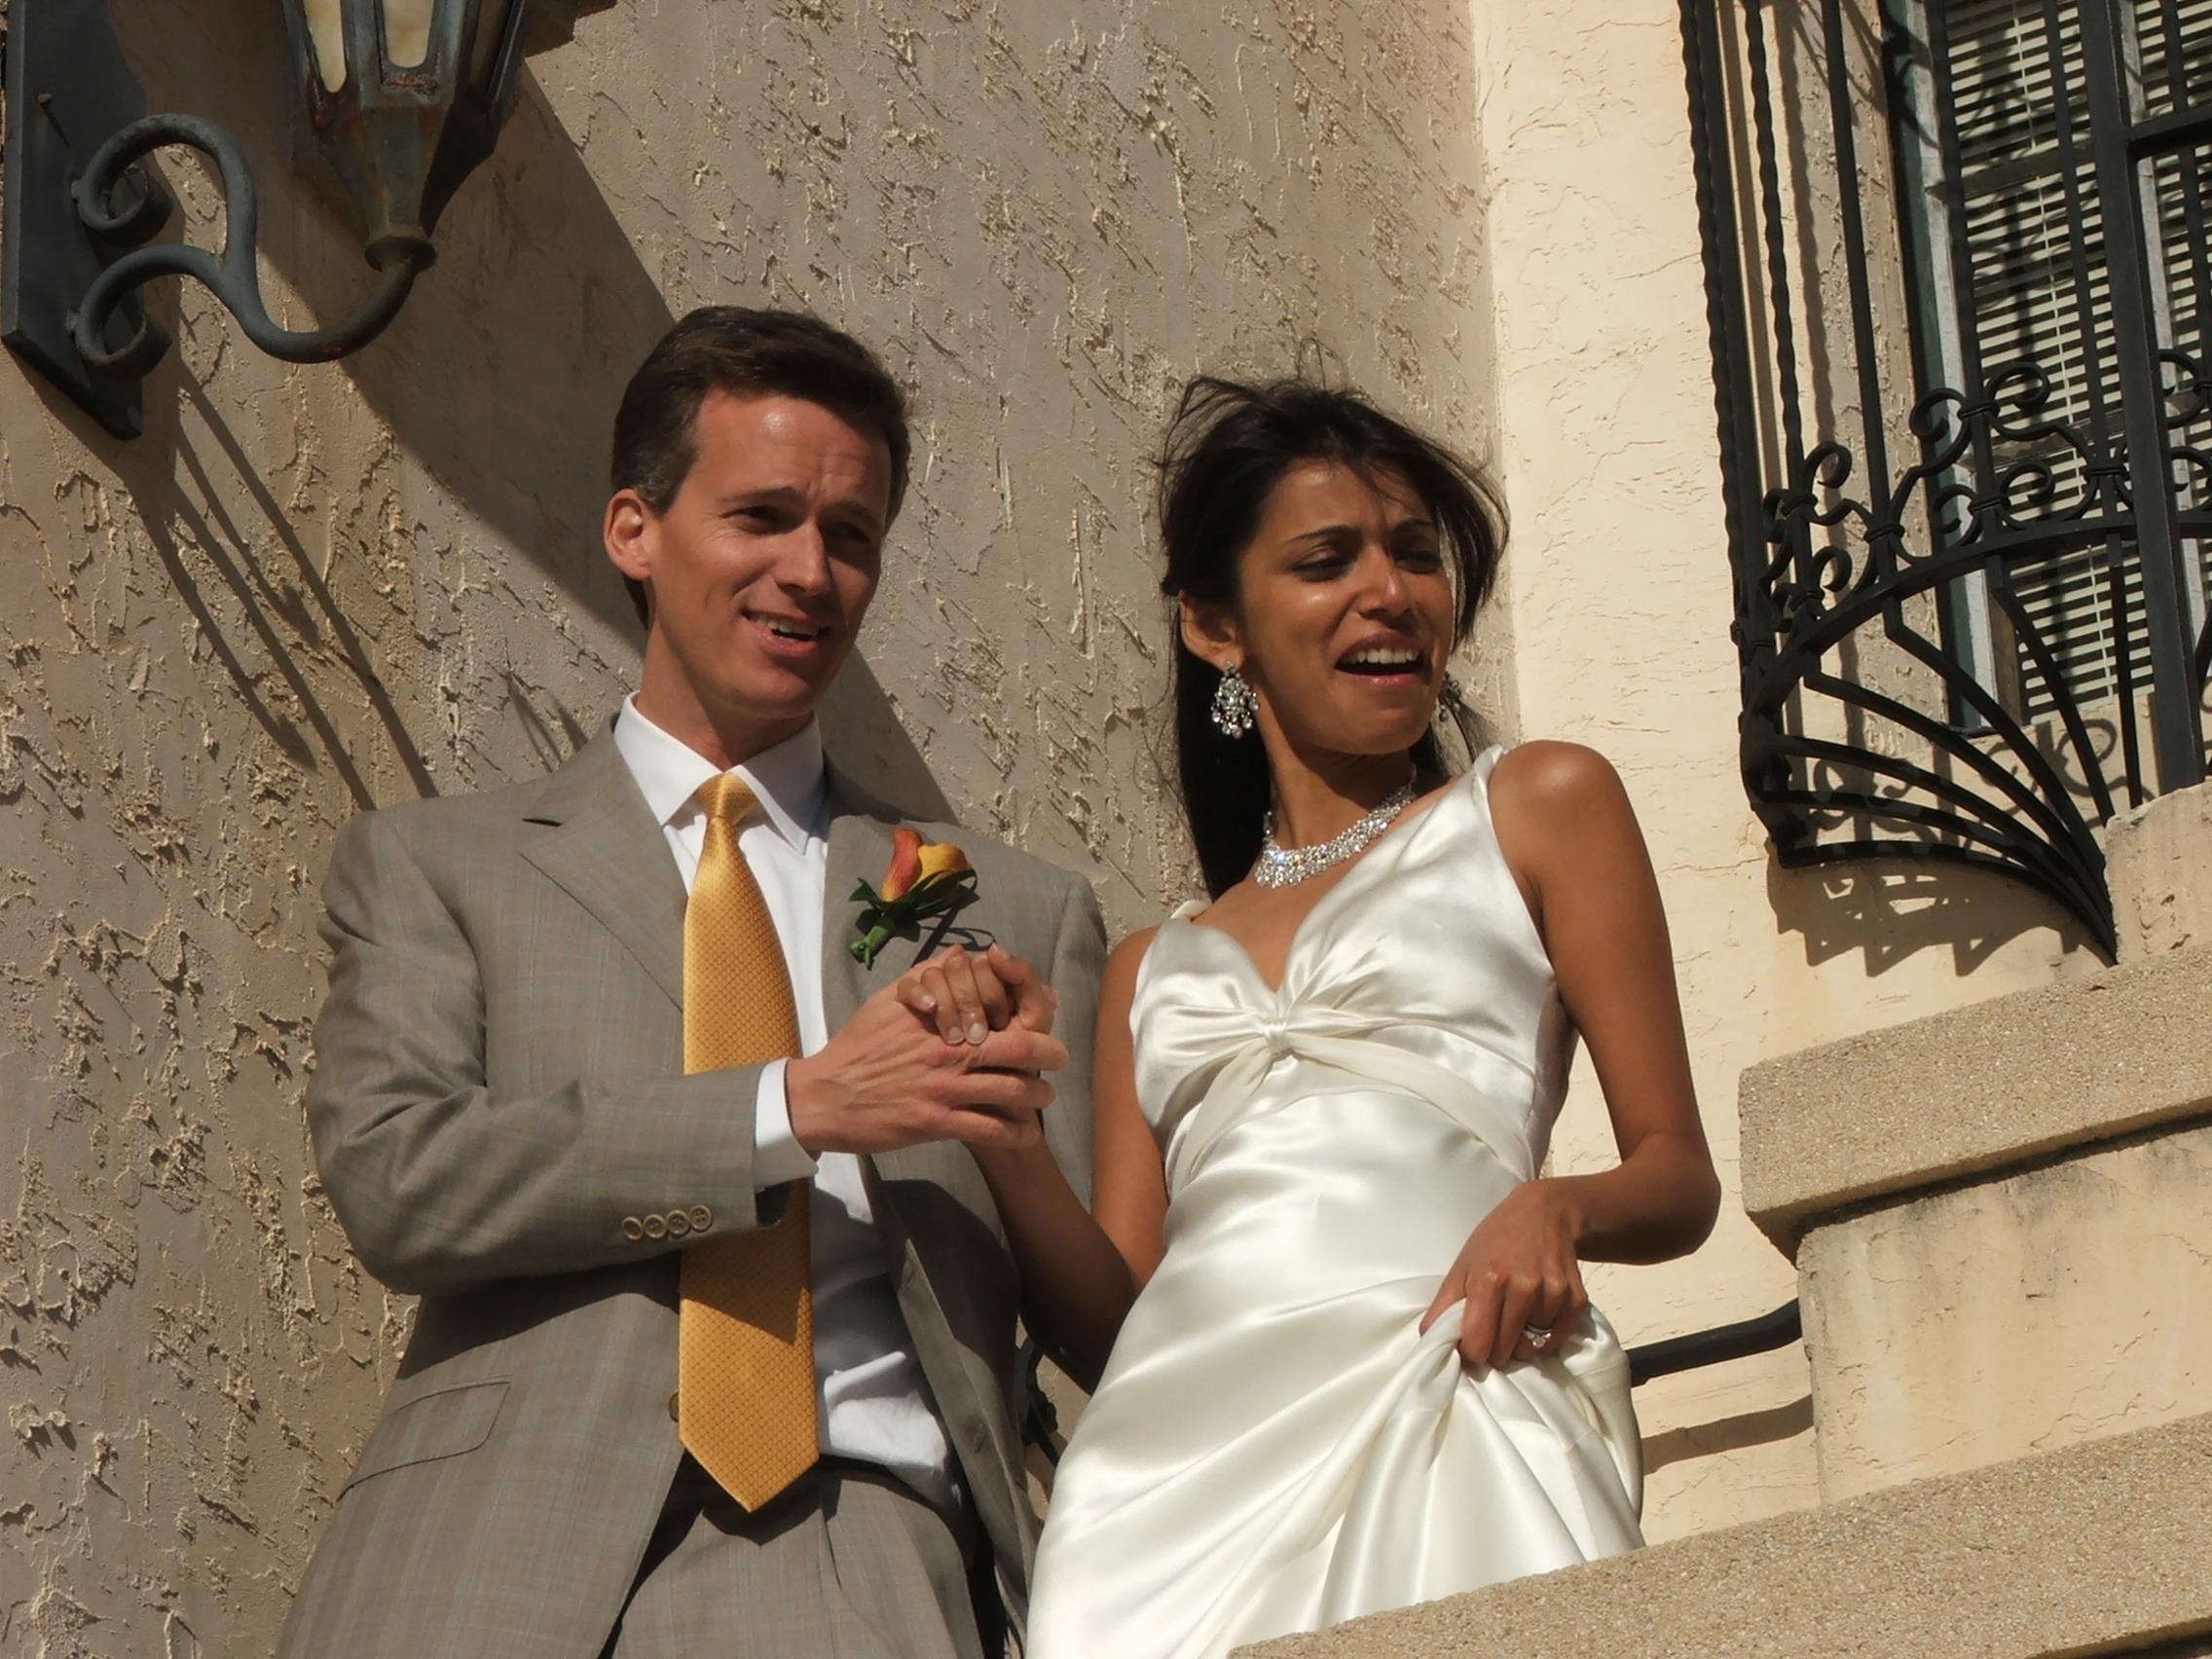 dave&sonila wedding 002.jpg